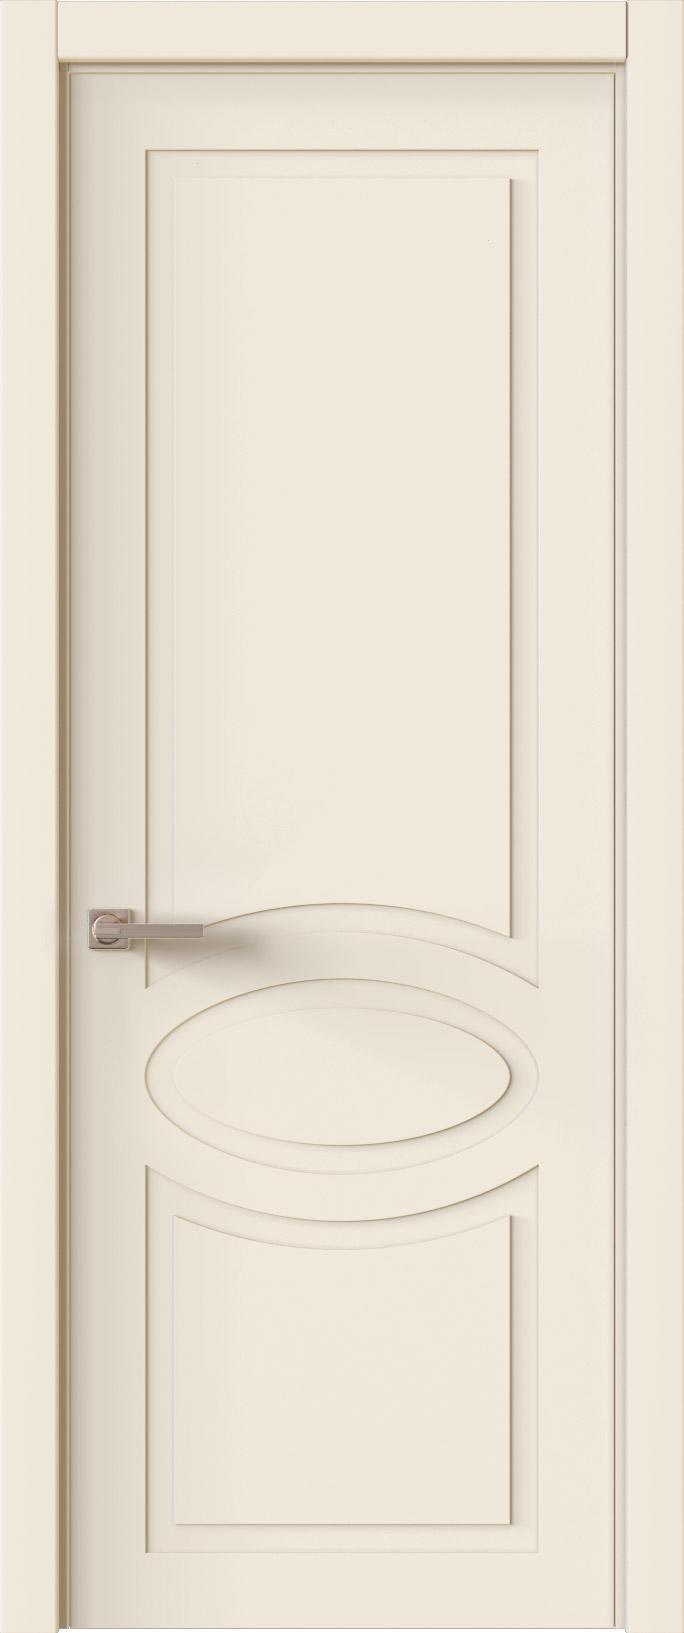 Tivoli Н-5 цвет - Бежевая эмаль (RAL 9010) Без стекла (ДГ)